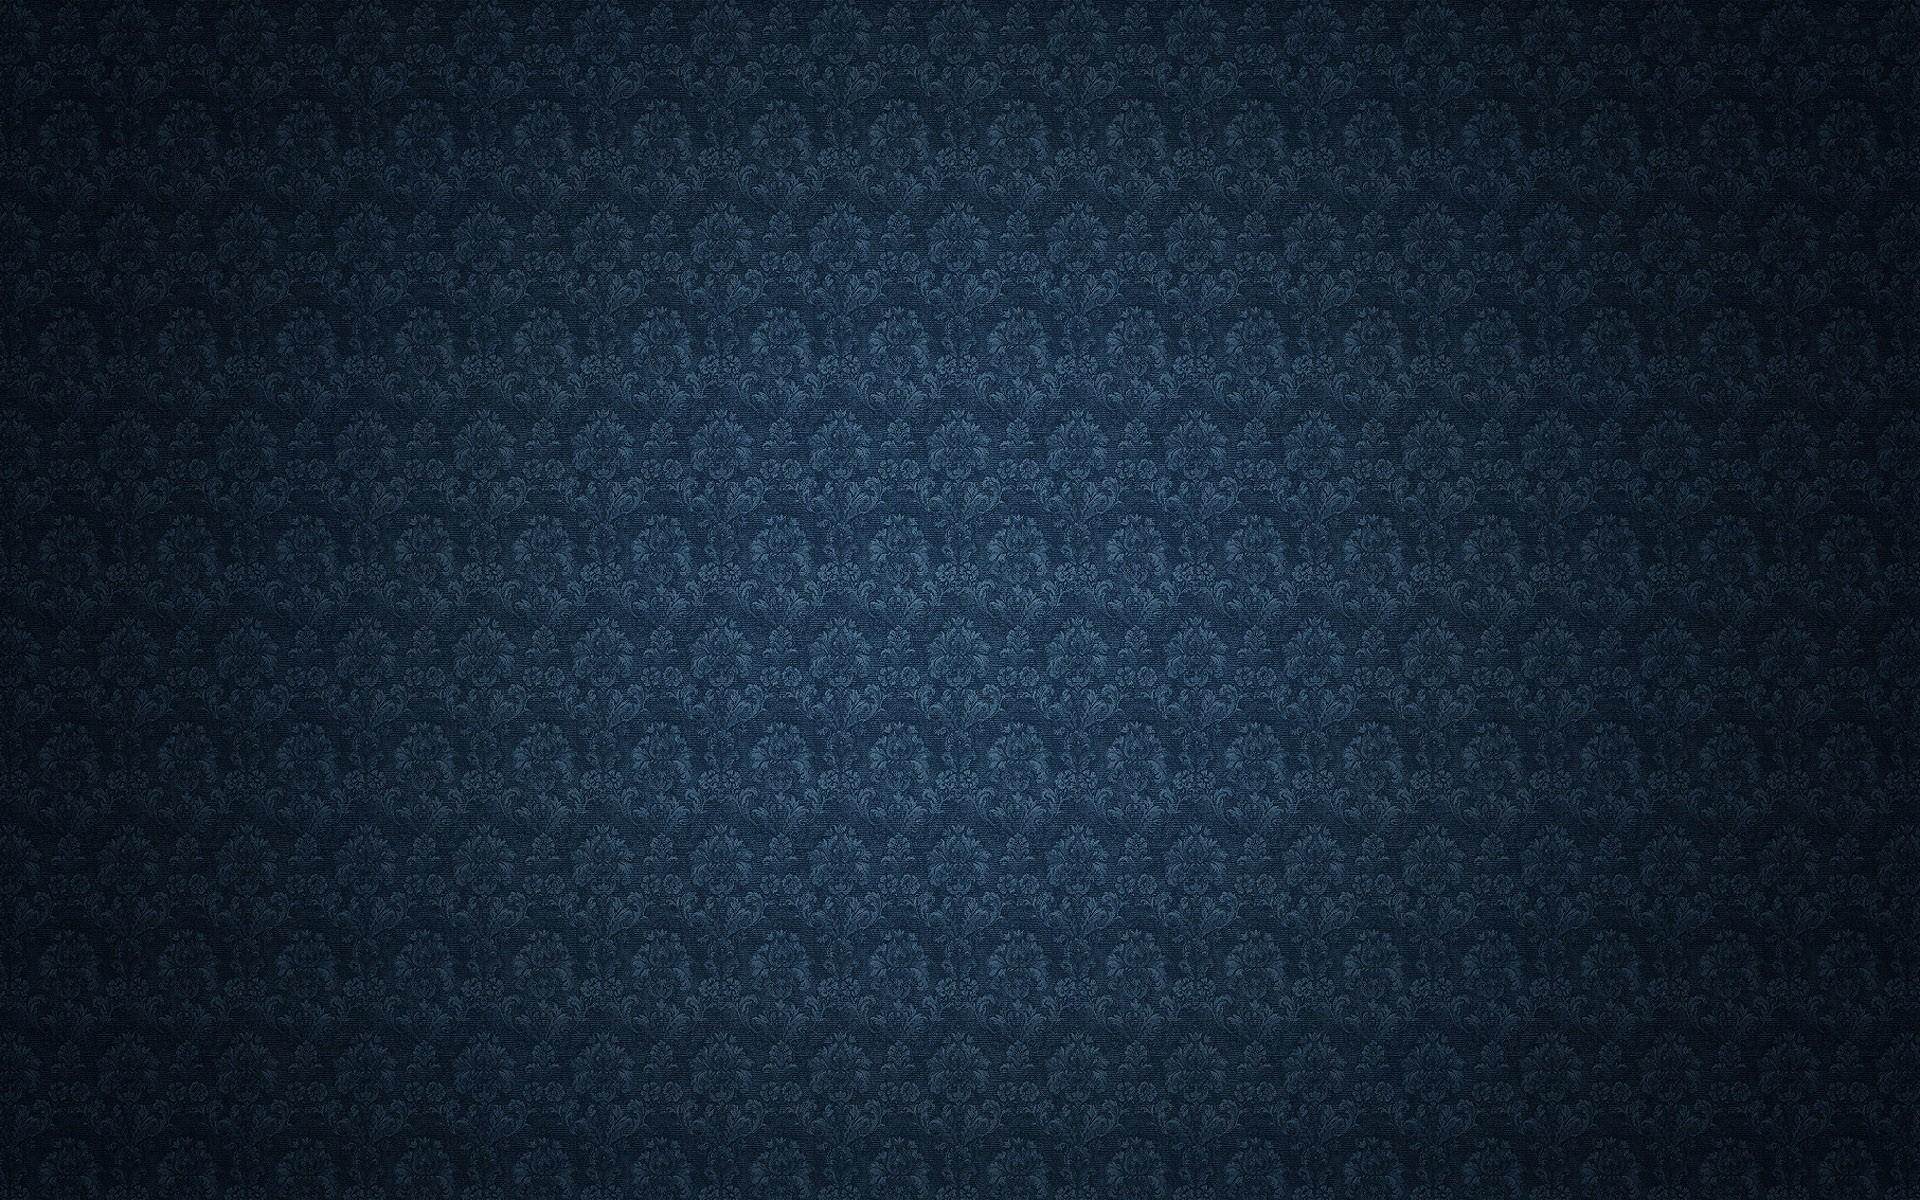 Dark Textures clipart blue texture background Dark Dark textures WallpaperSafari abstract